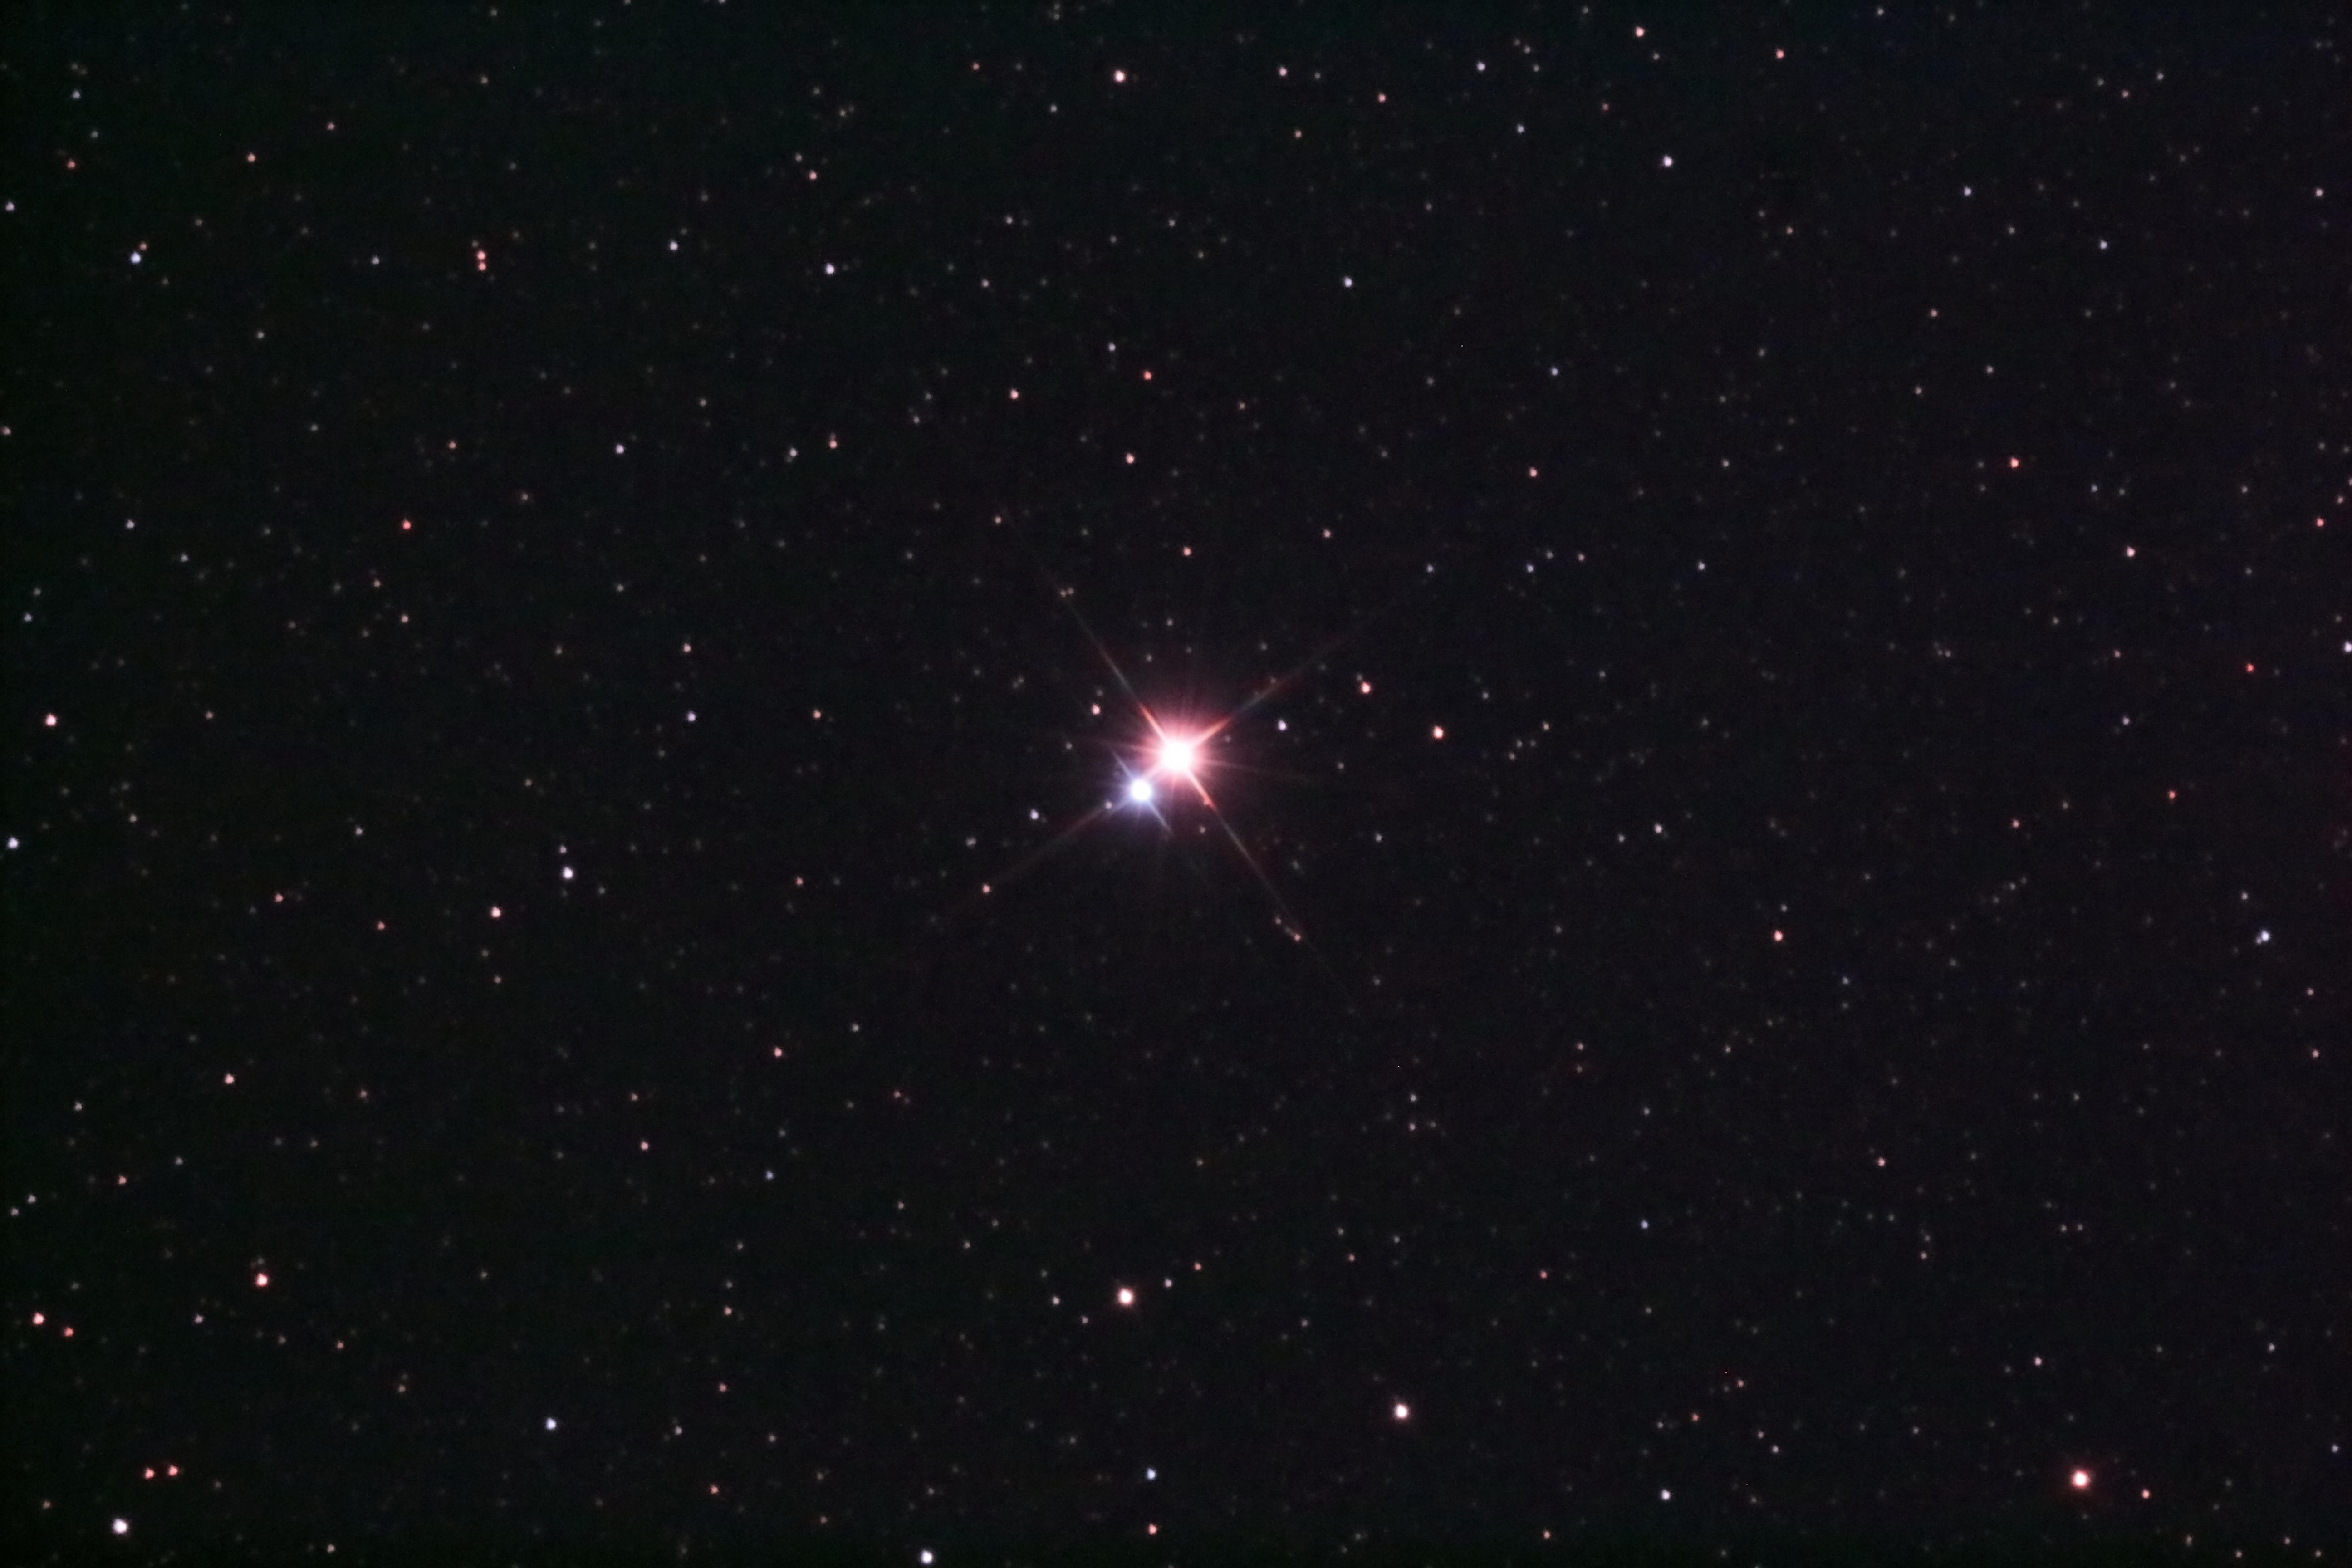 https://astrofilicernusco.org/storage/2020/12/ISO1600_30s__-10C-albireo.jpg